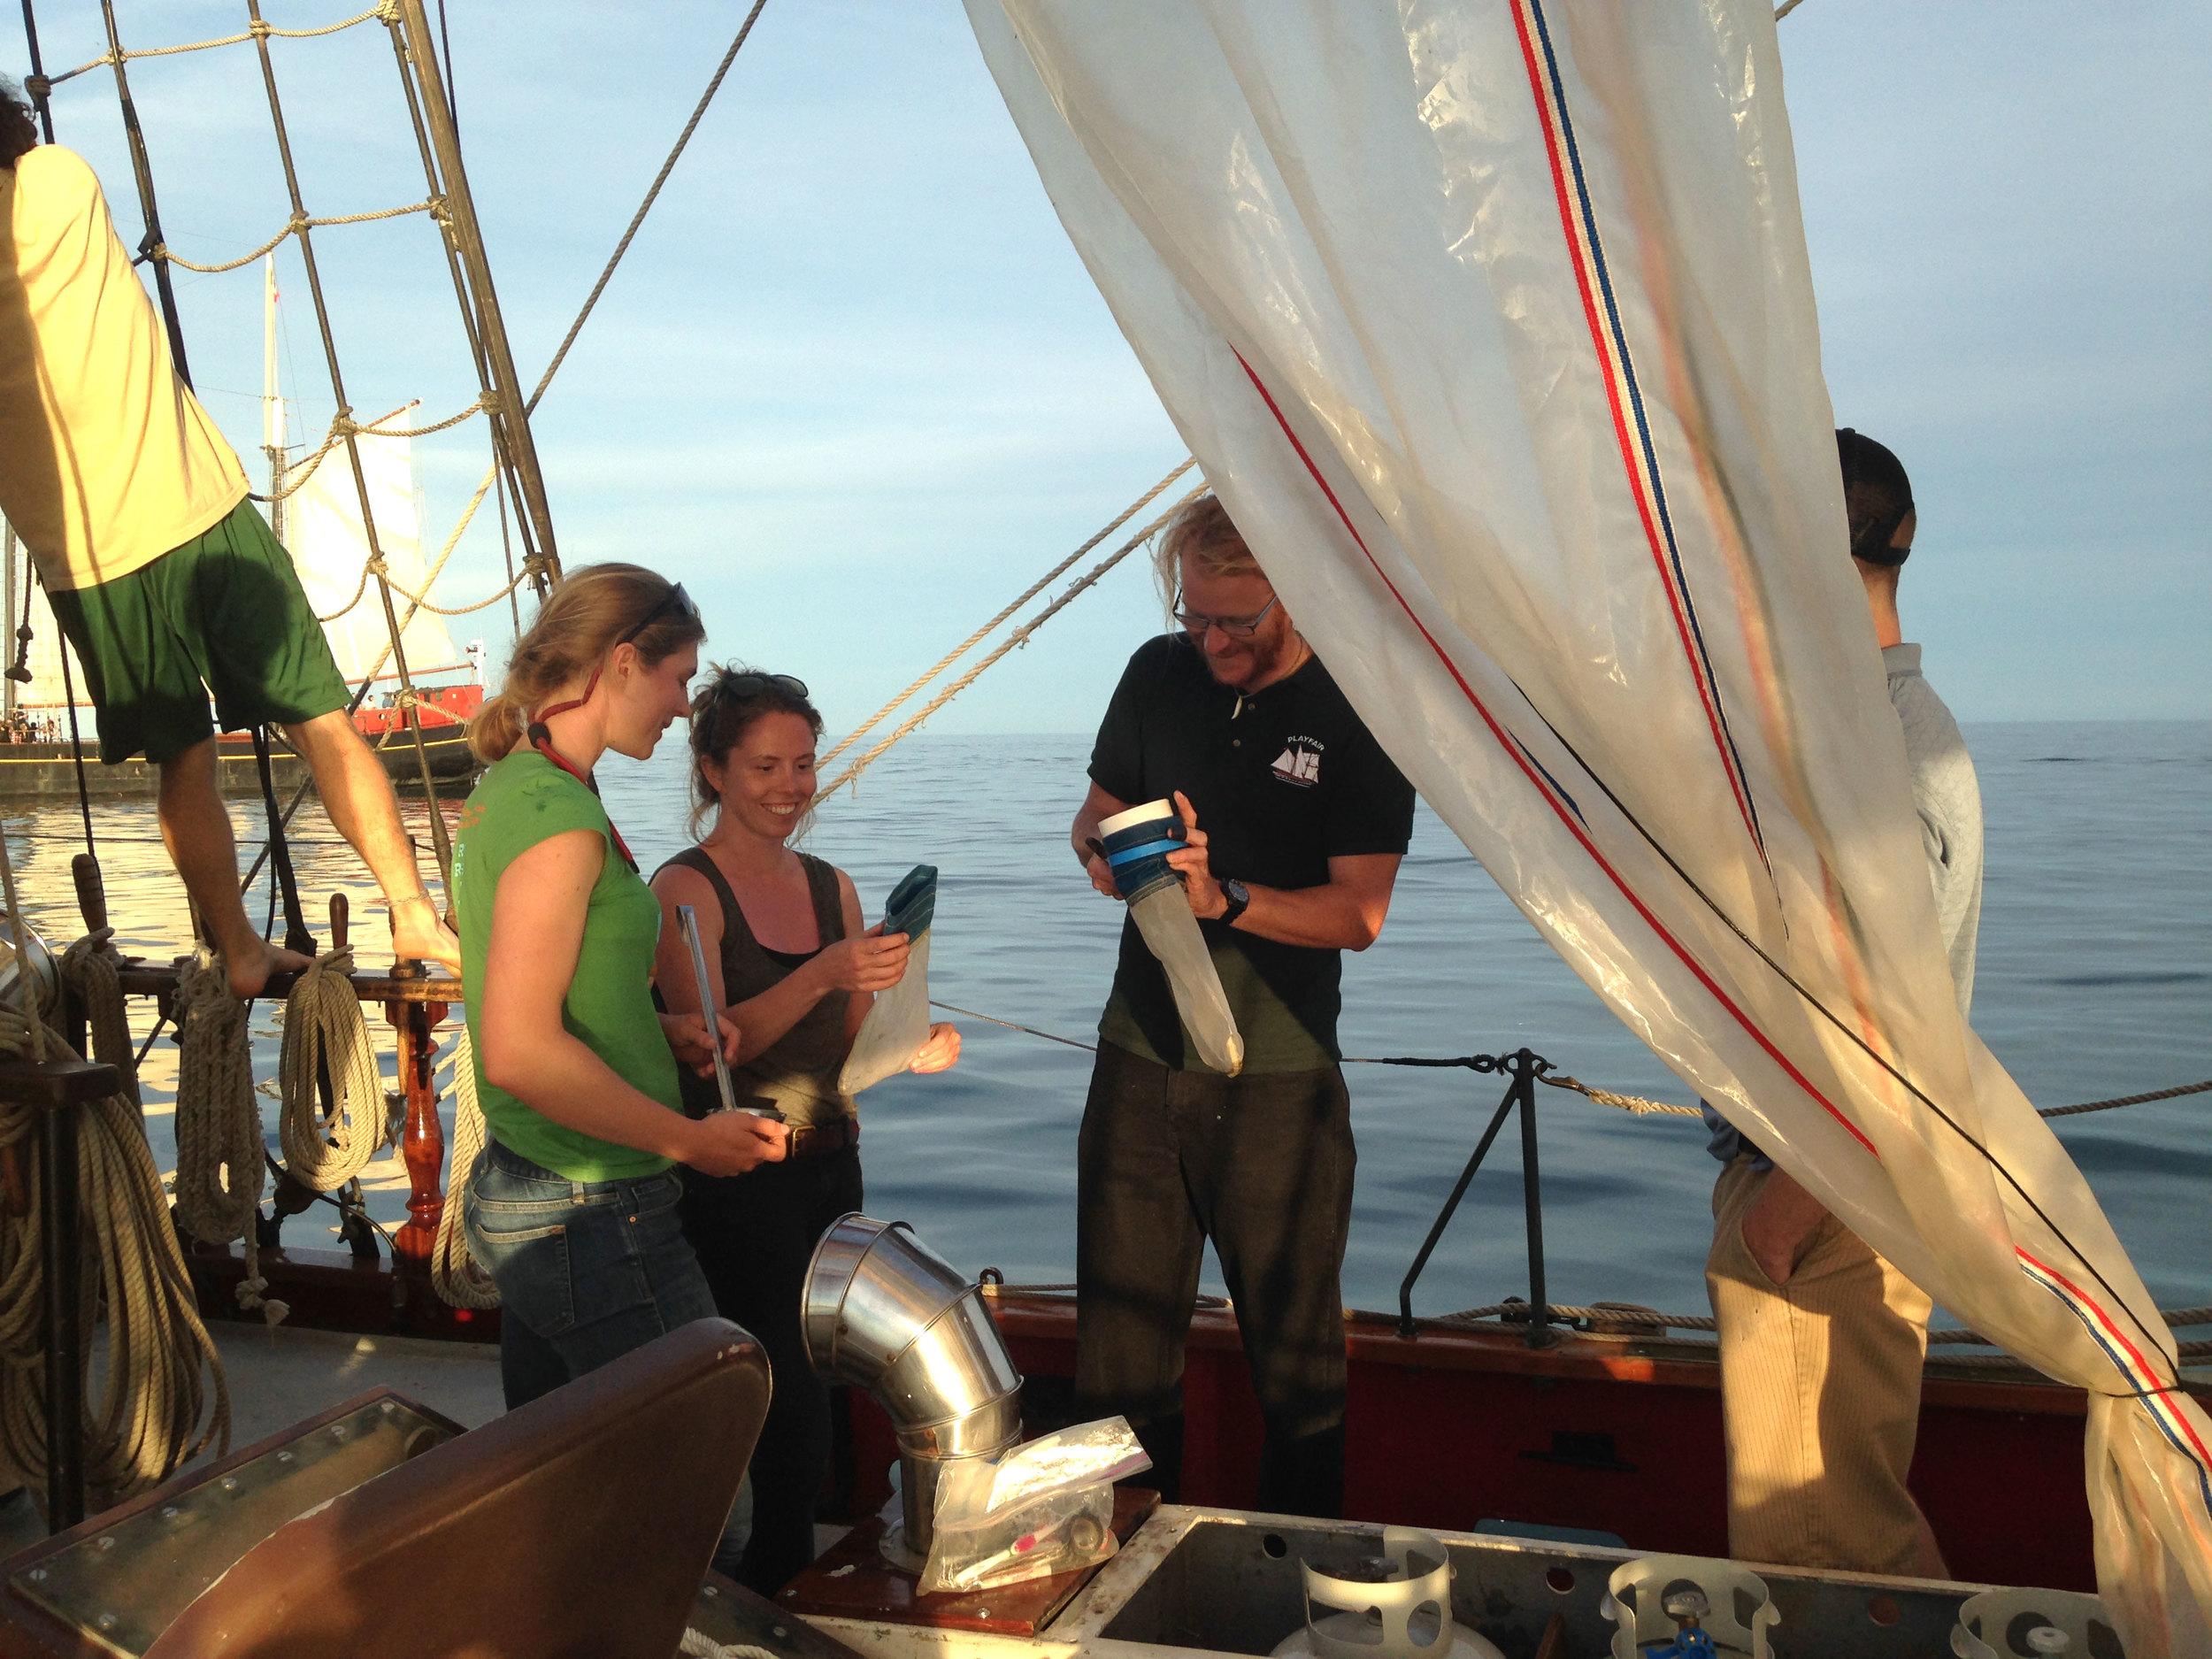 Anika Ballent,Lisa Erdle,andMaster Patrick Shore collecting microplastics in Humber Bay. (Photo via Lake Ontario Waterkeeper)